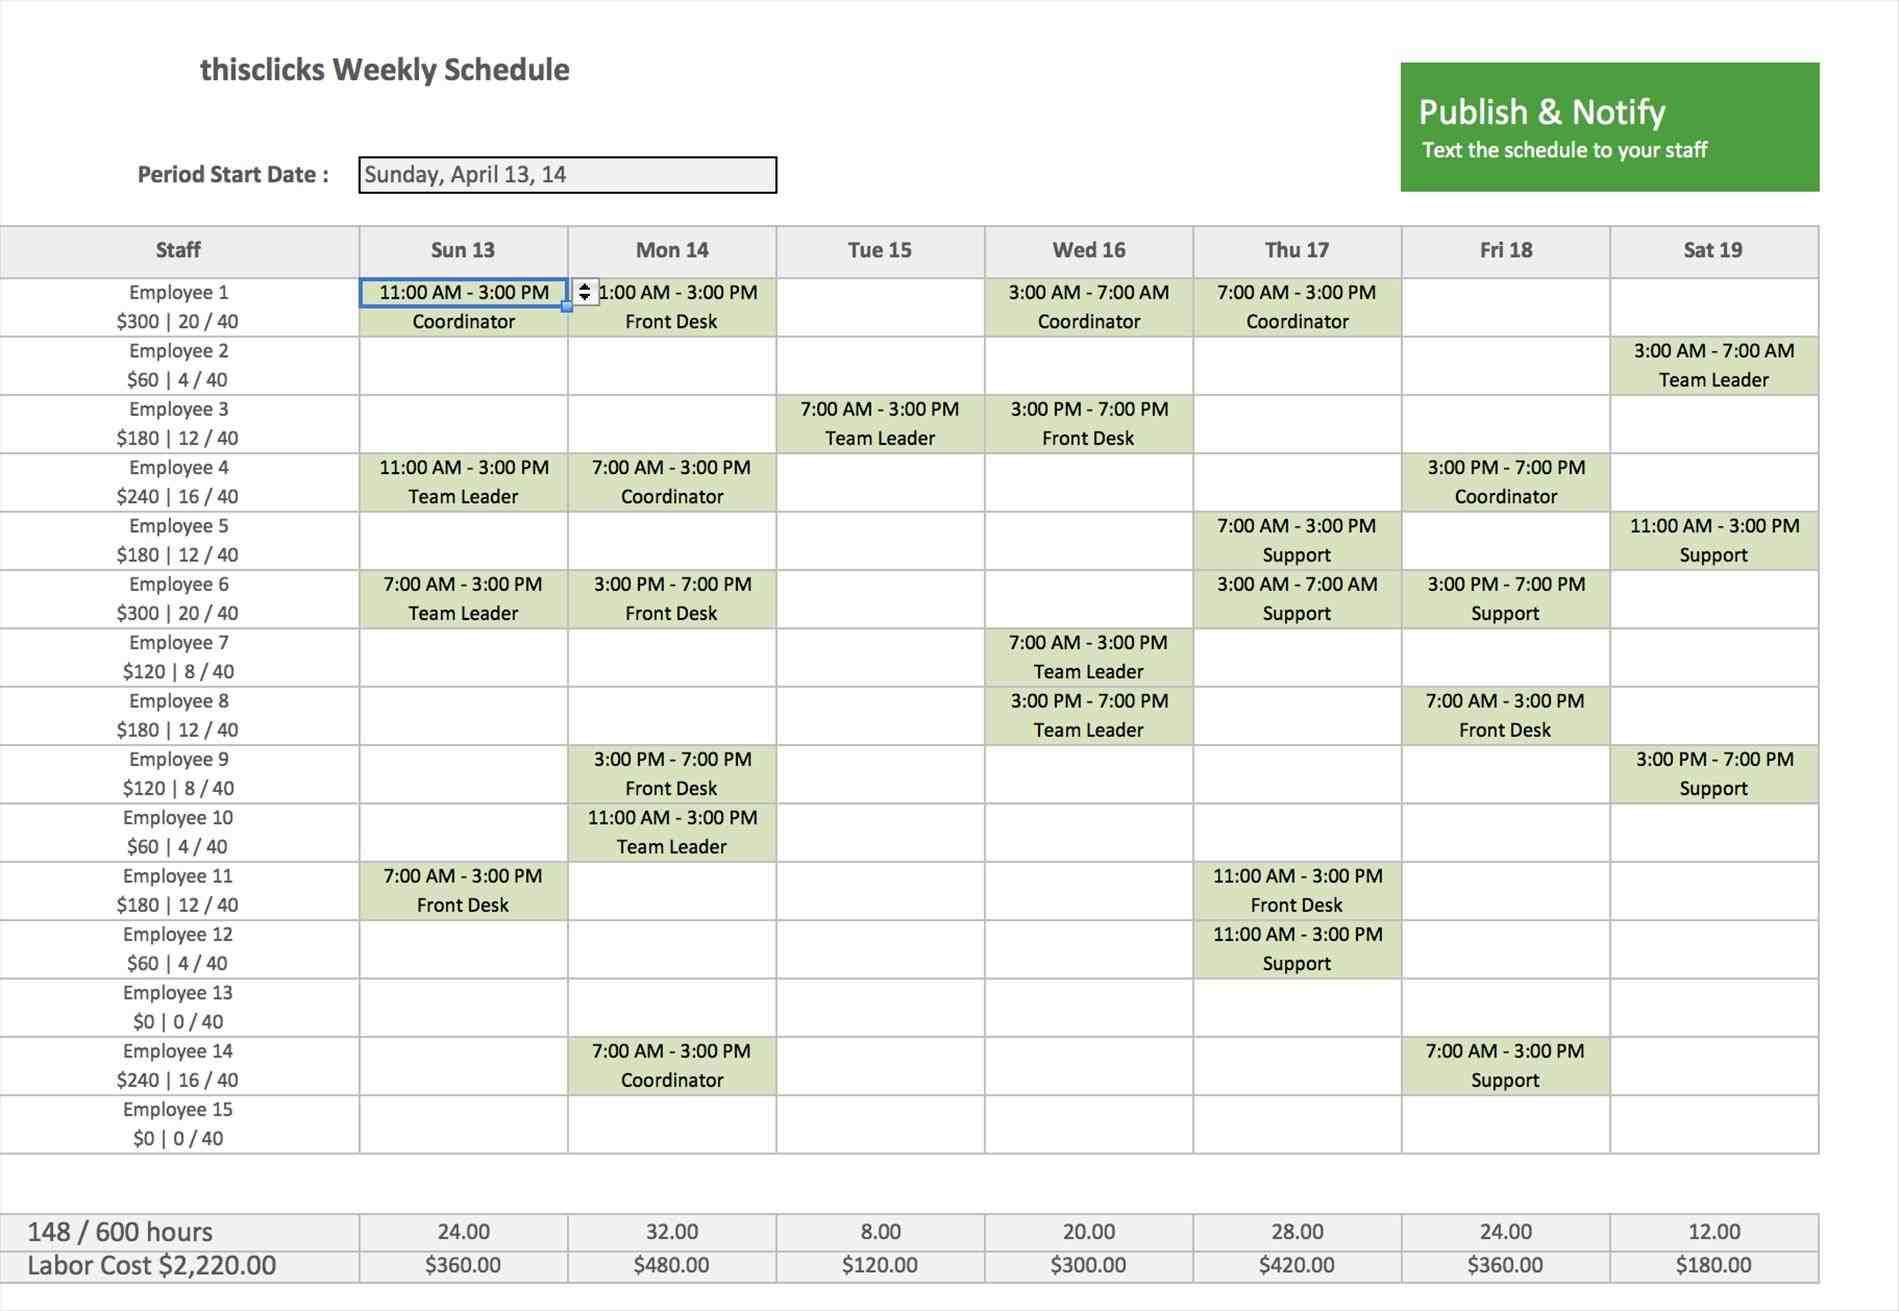 calendars calendar budget template letter planner executive resume work Employee Work Calendars calendar budget template letter planner executive resume monthly